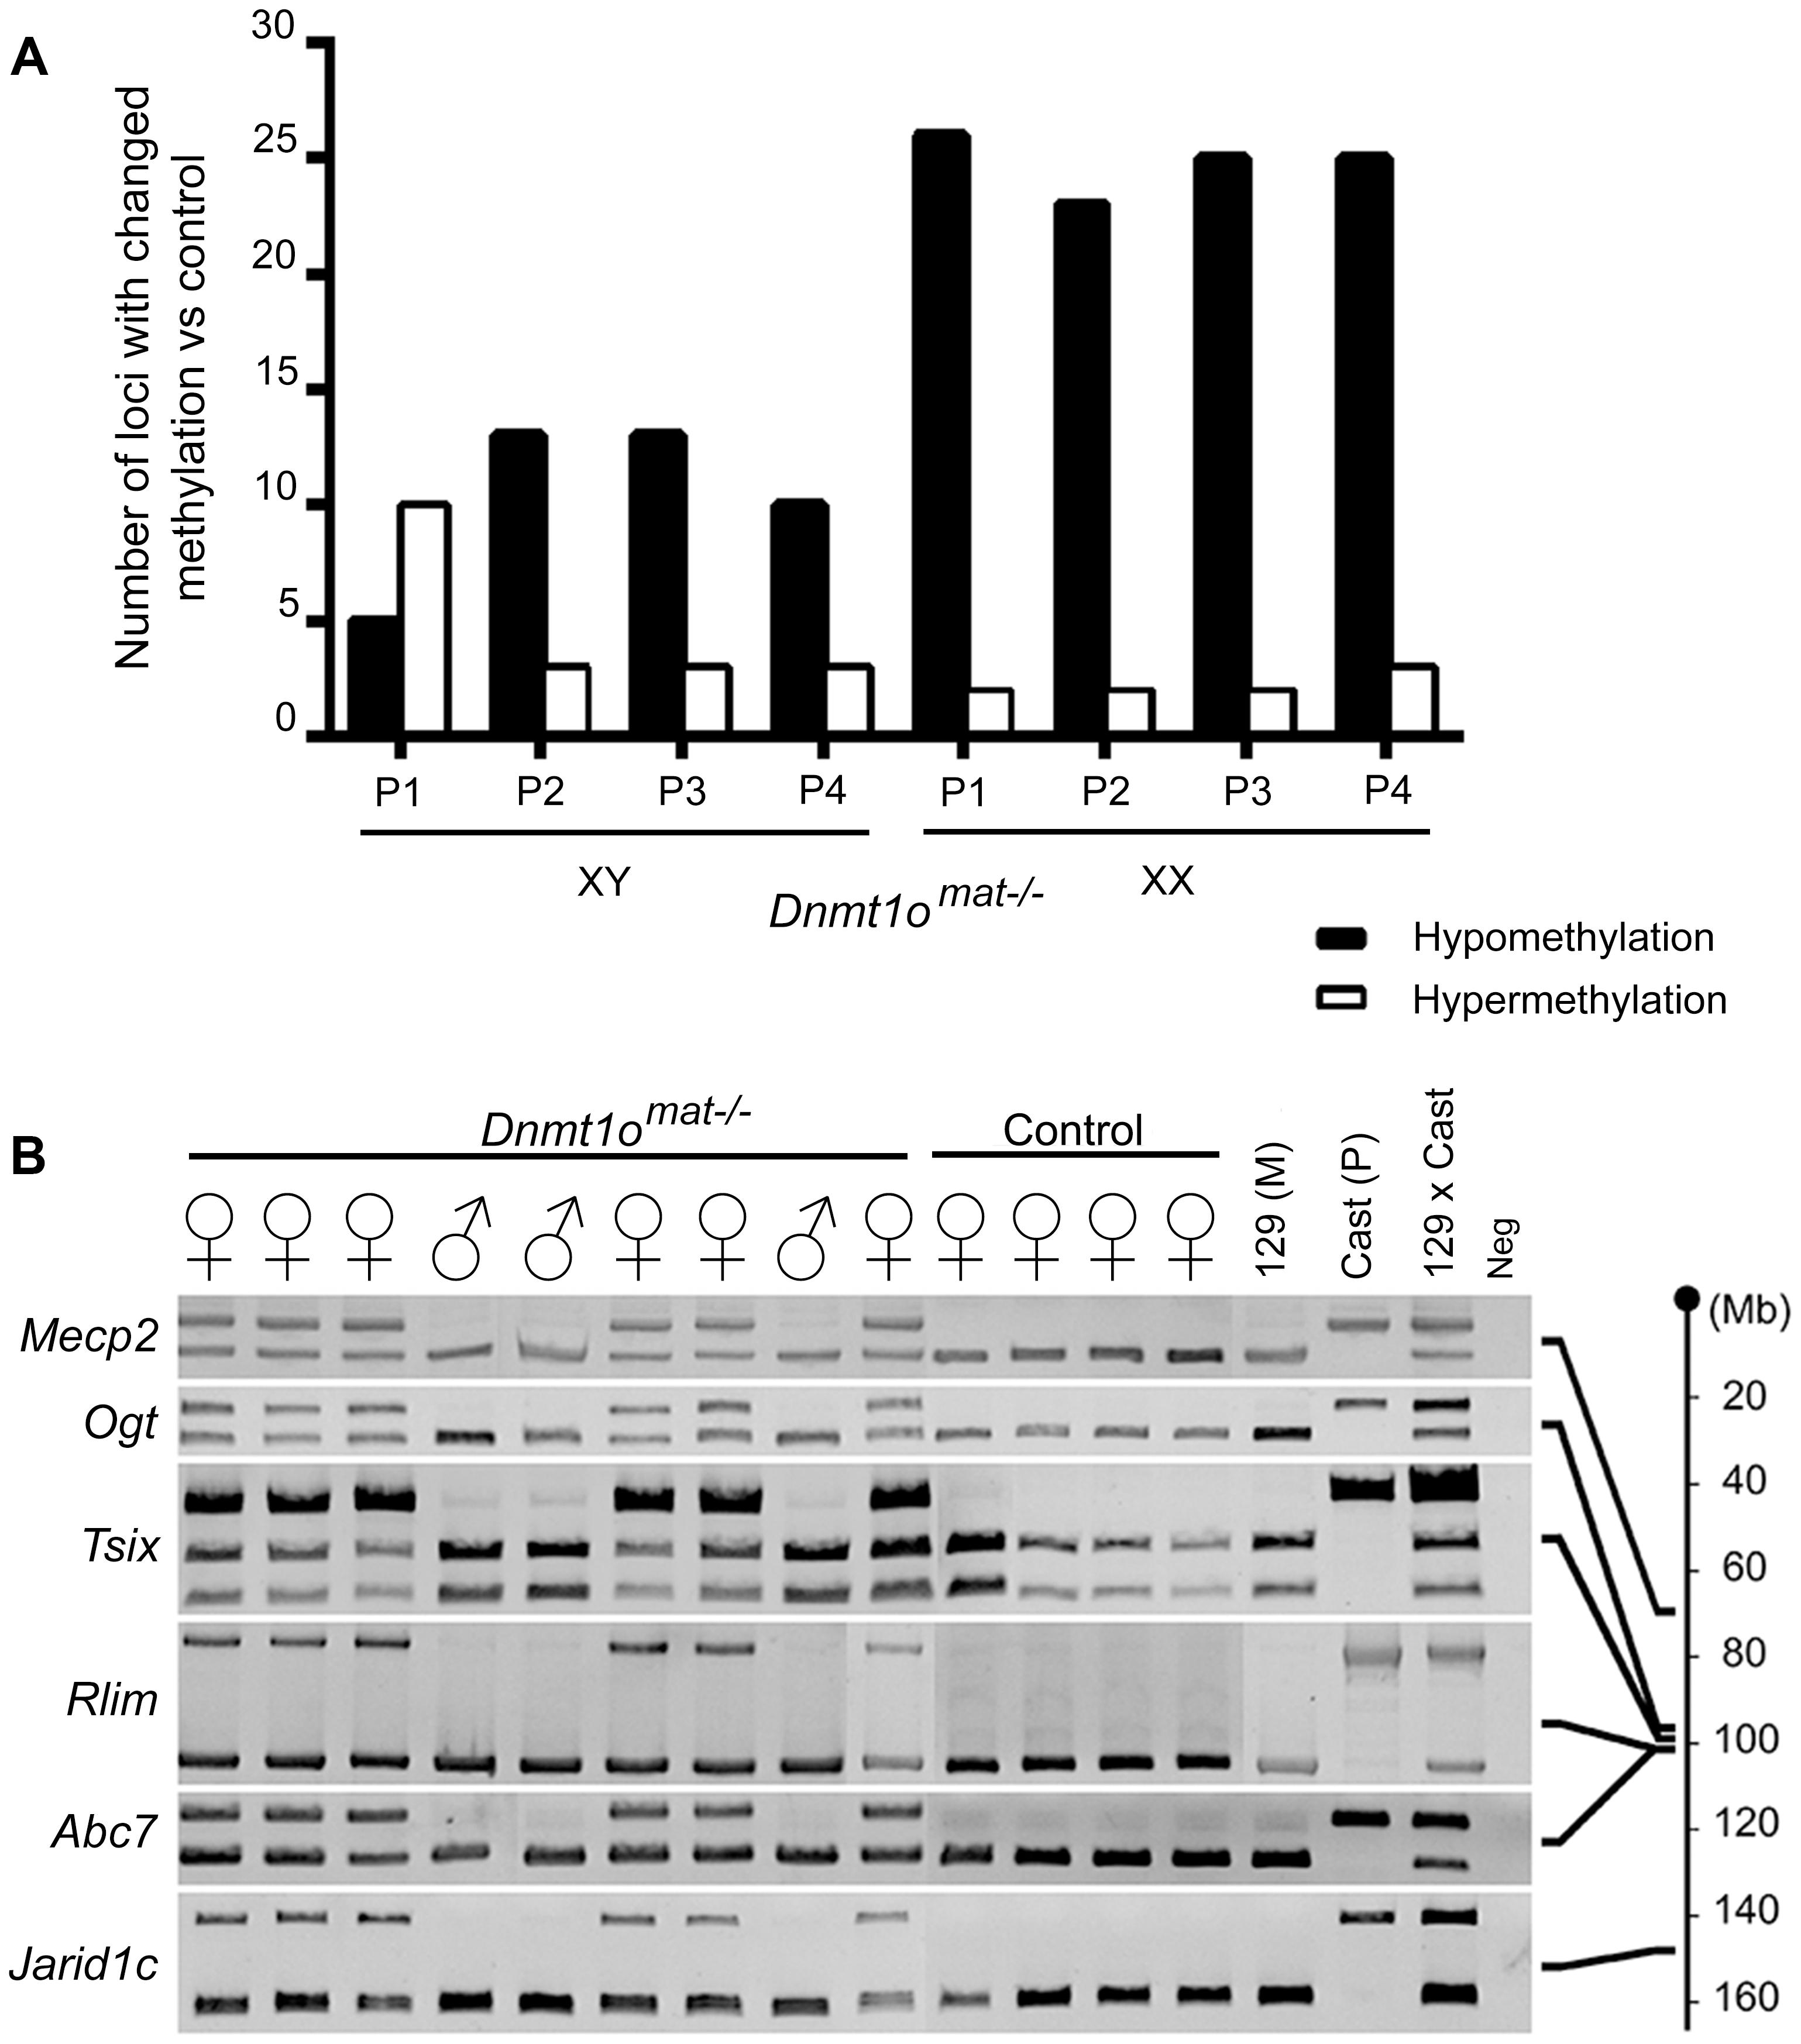 DNA methylation and allelic expression analyses of <i>Dnmt1o<sup>mat−/−</sup></i> female placentae.